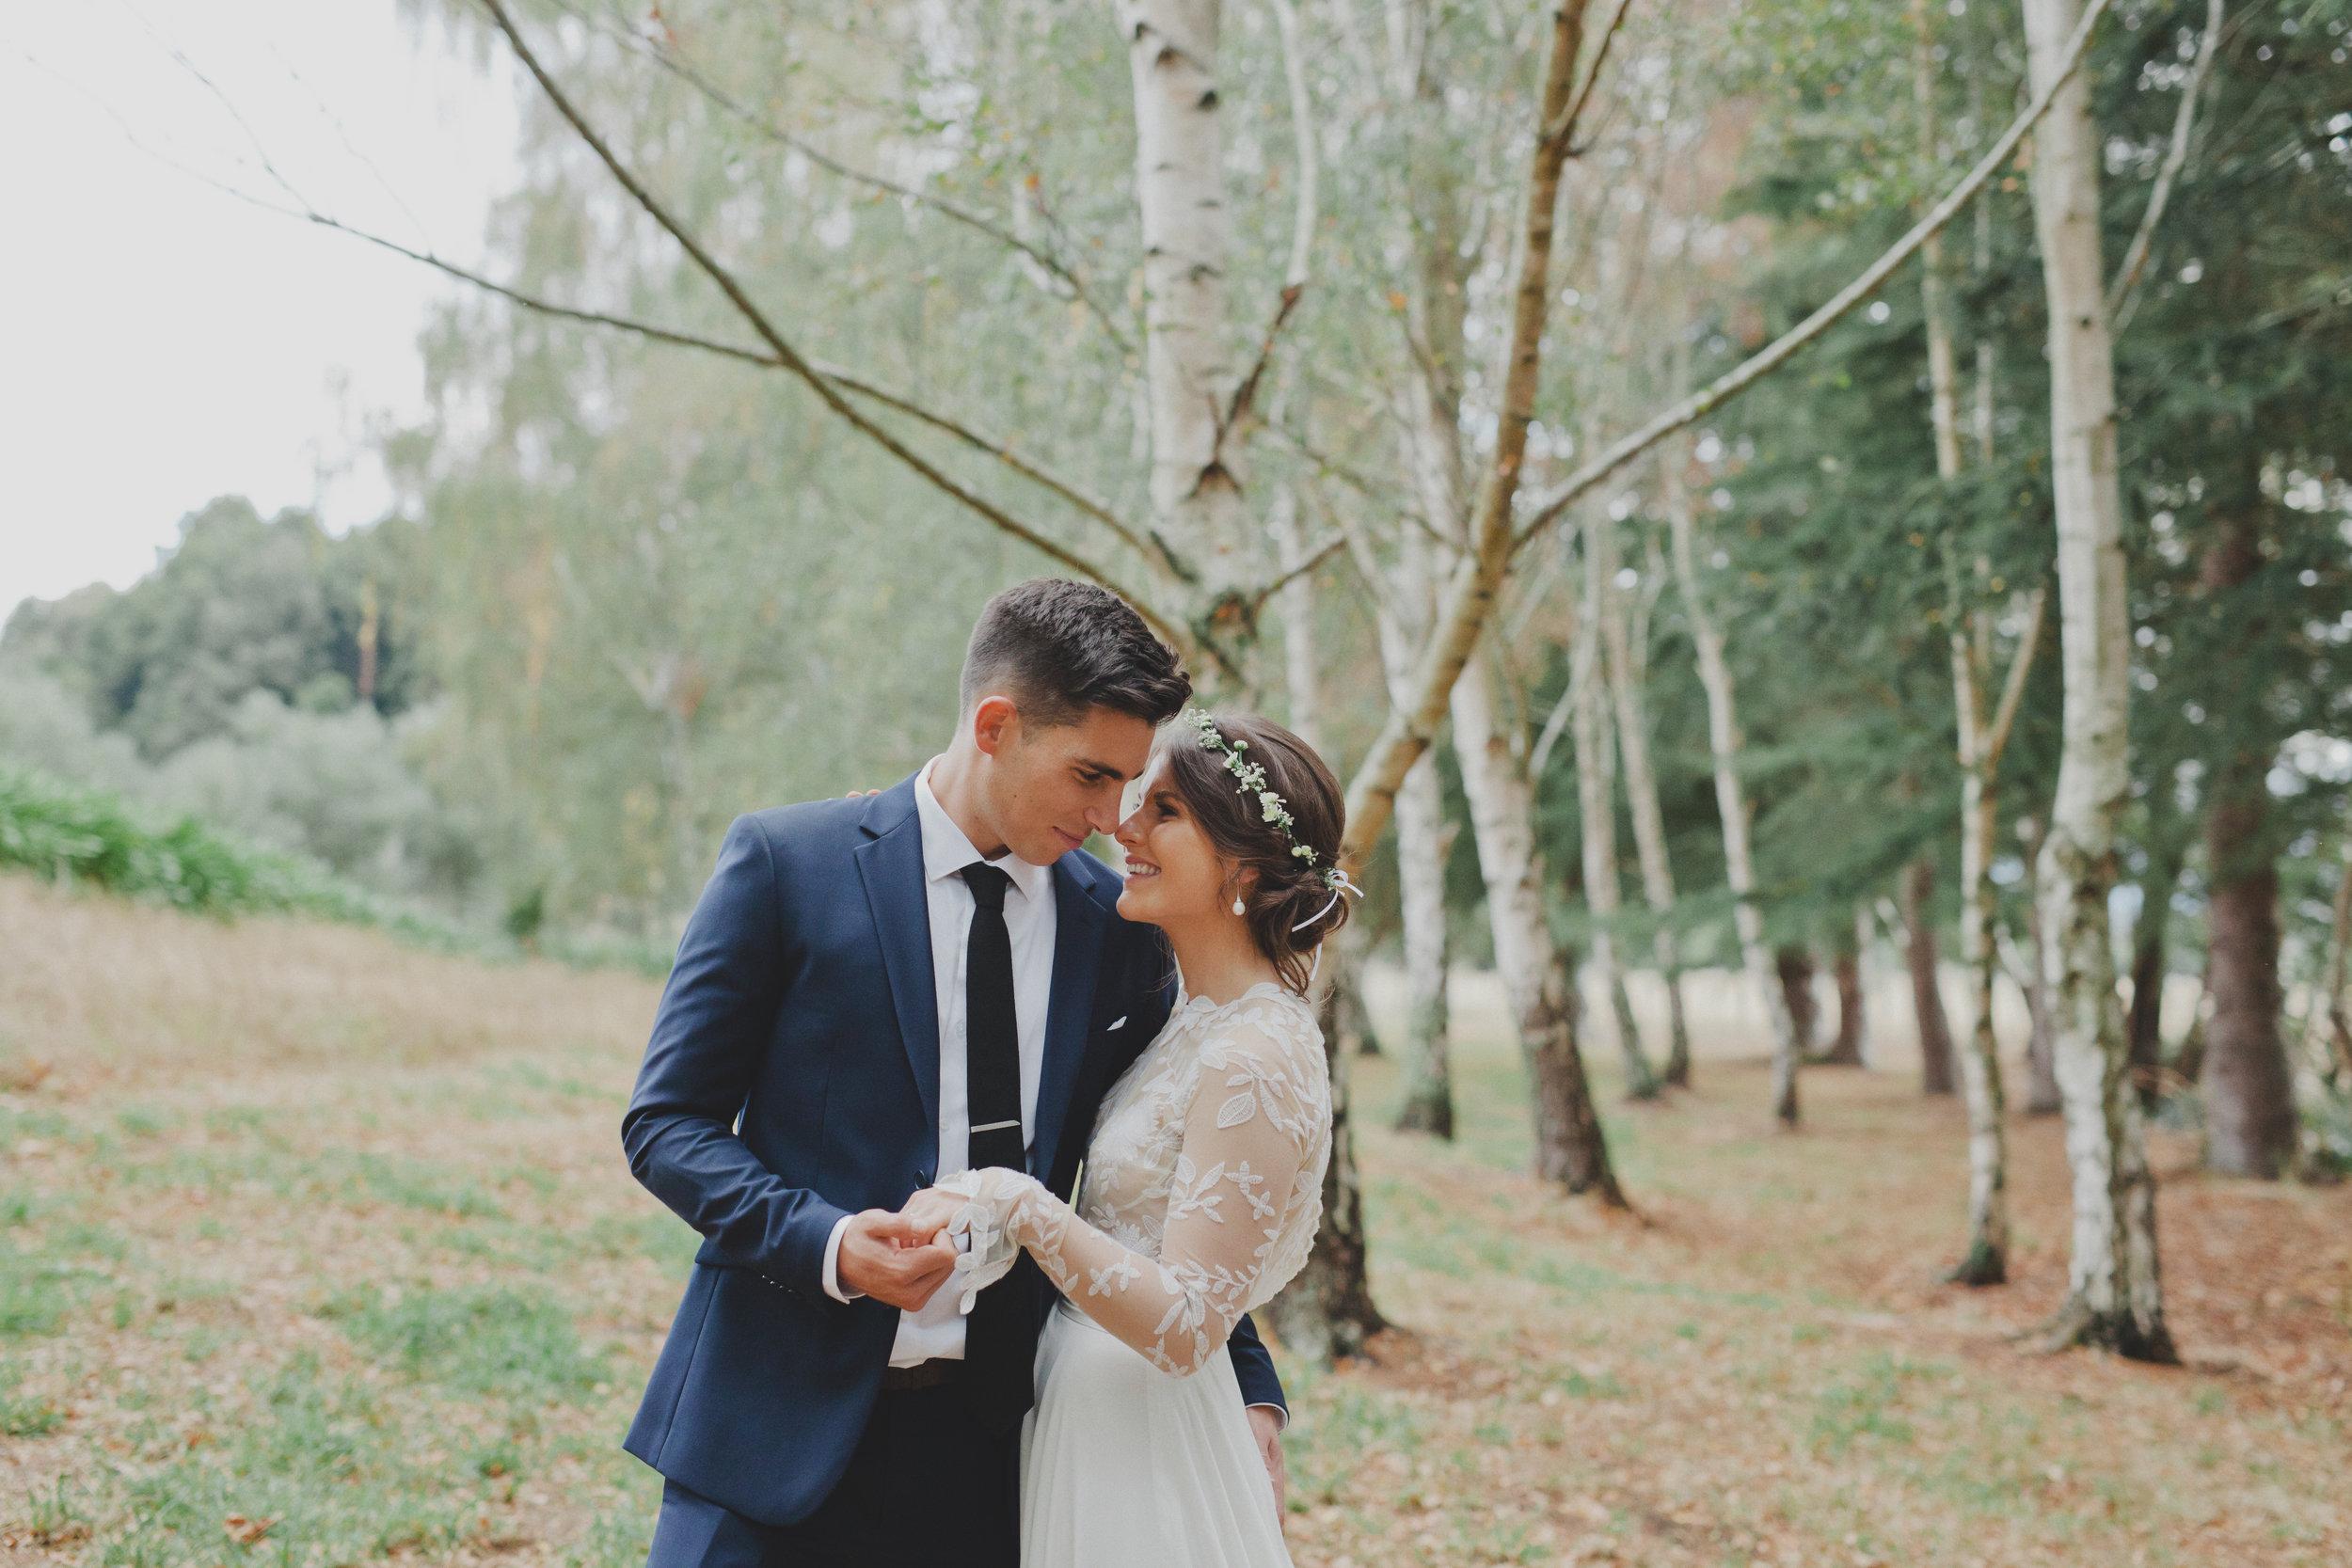 wellington wedding photography NZ - 1099.JPG